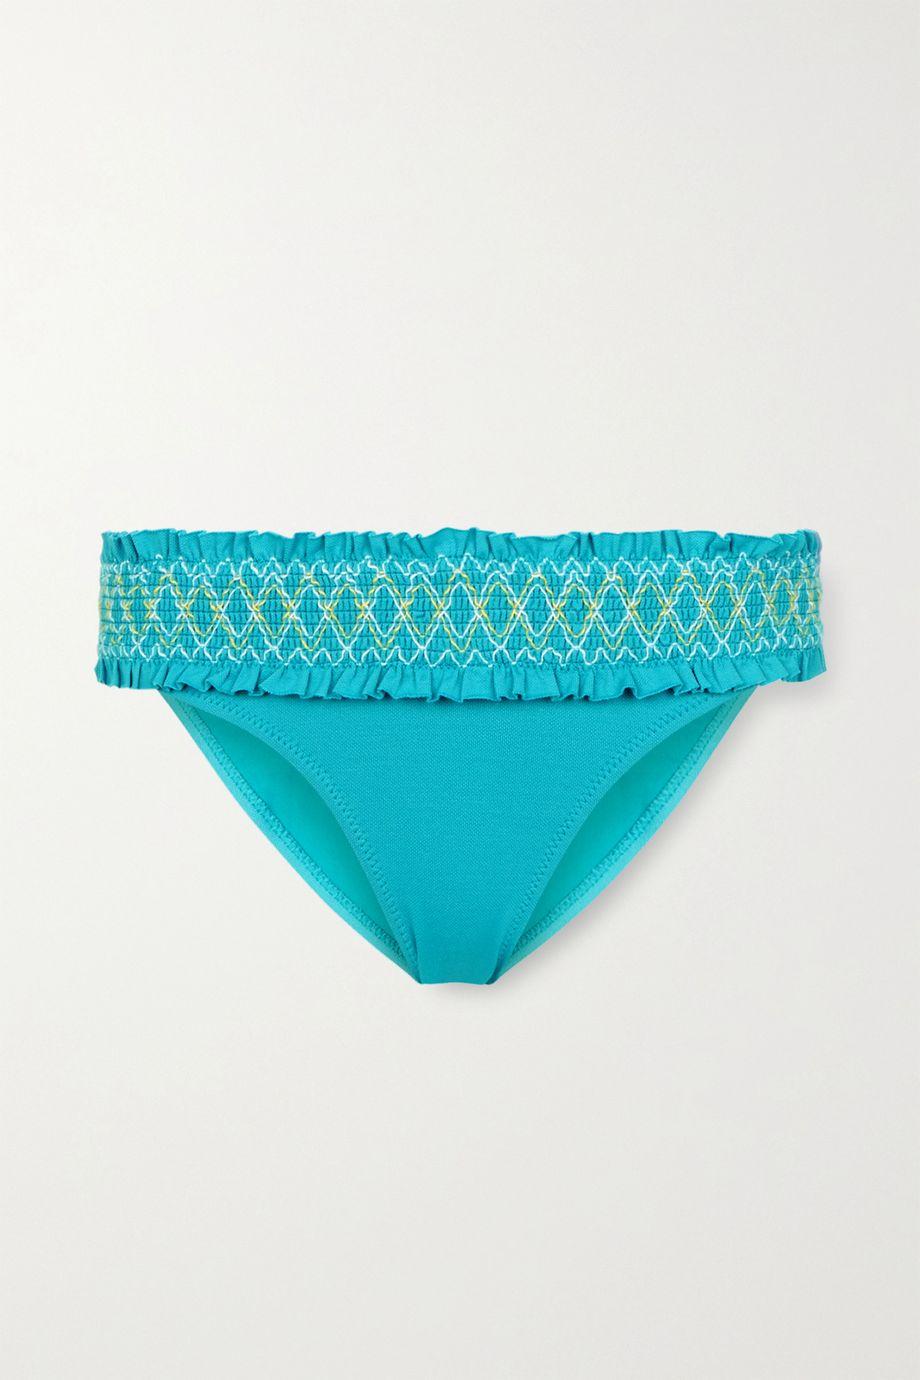 Heidi Klein Aruba smocked bikini briefs